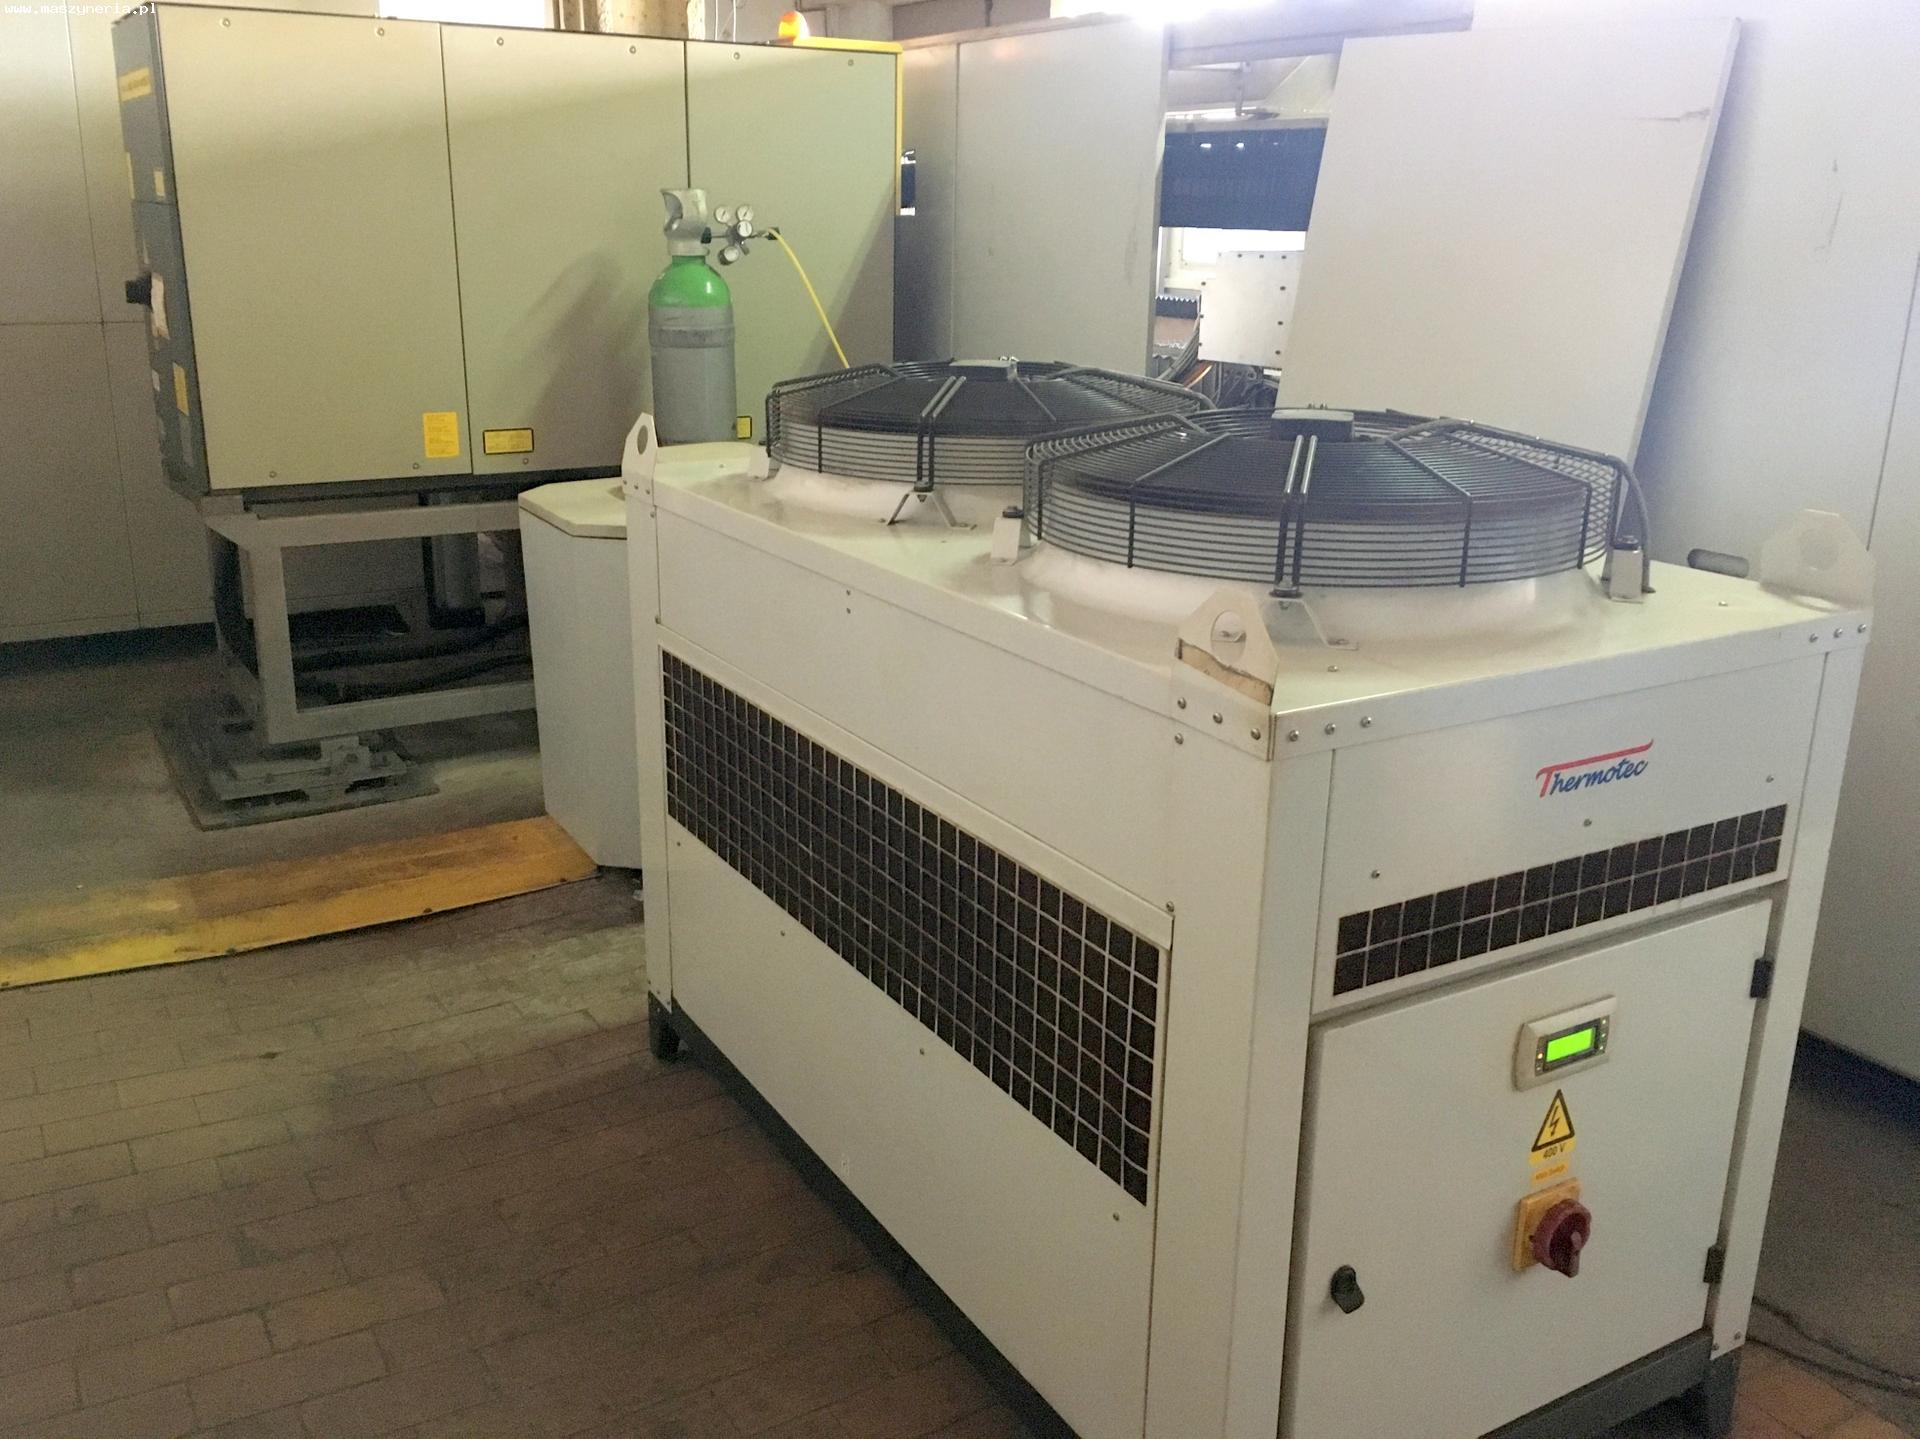 Macchina taglio laser ERMAKSAN LASERMAK 4000,3 x 1,5 in vendita - foto 8